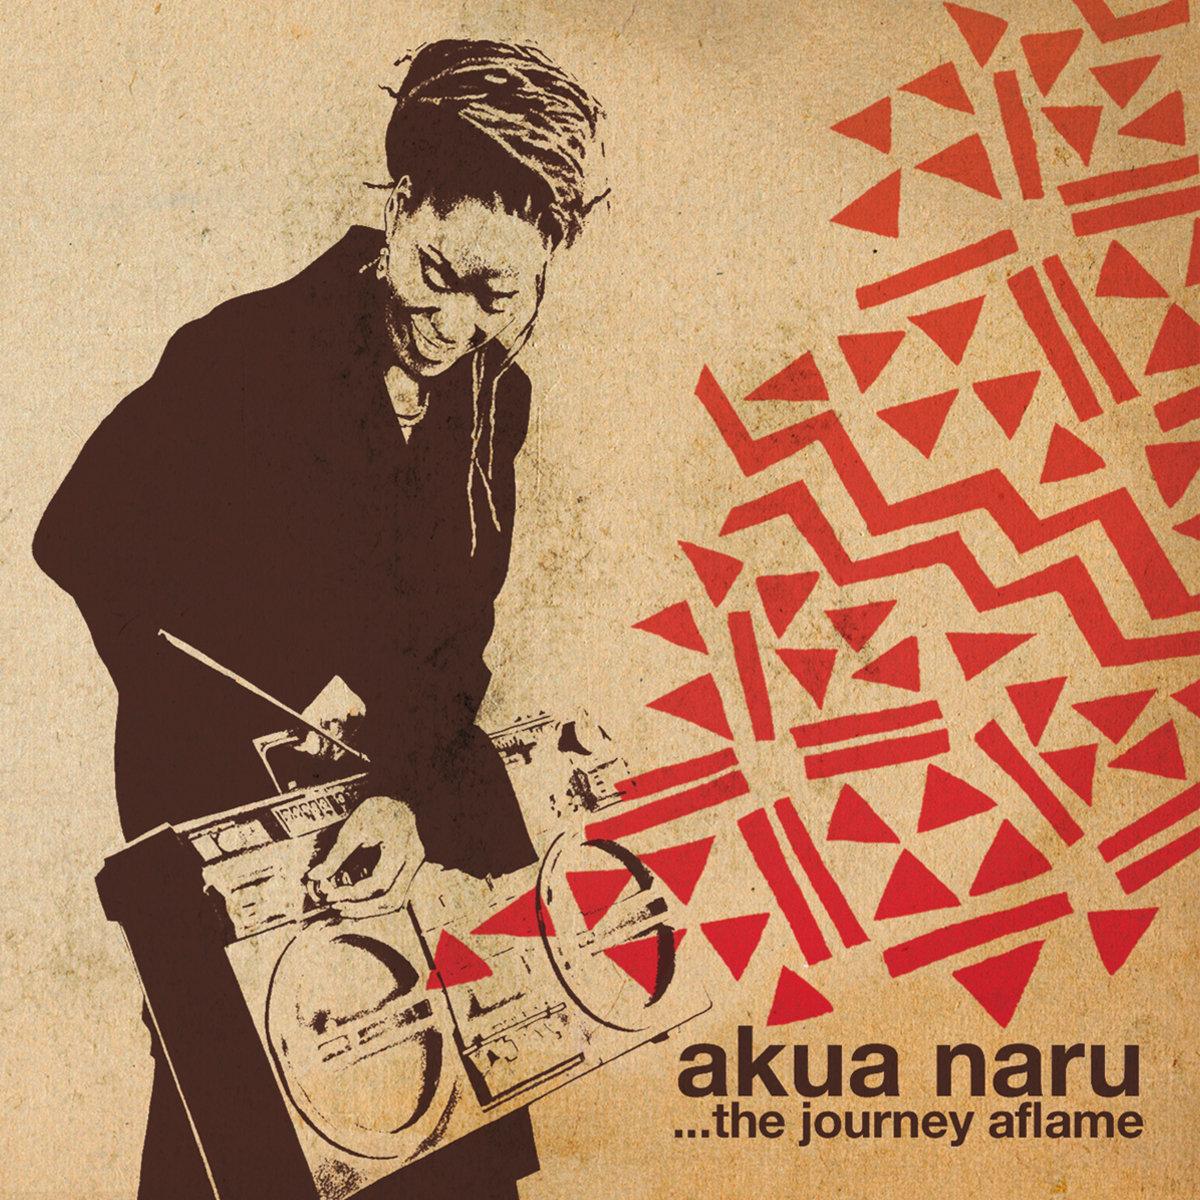 akua naru the journey aflame album